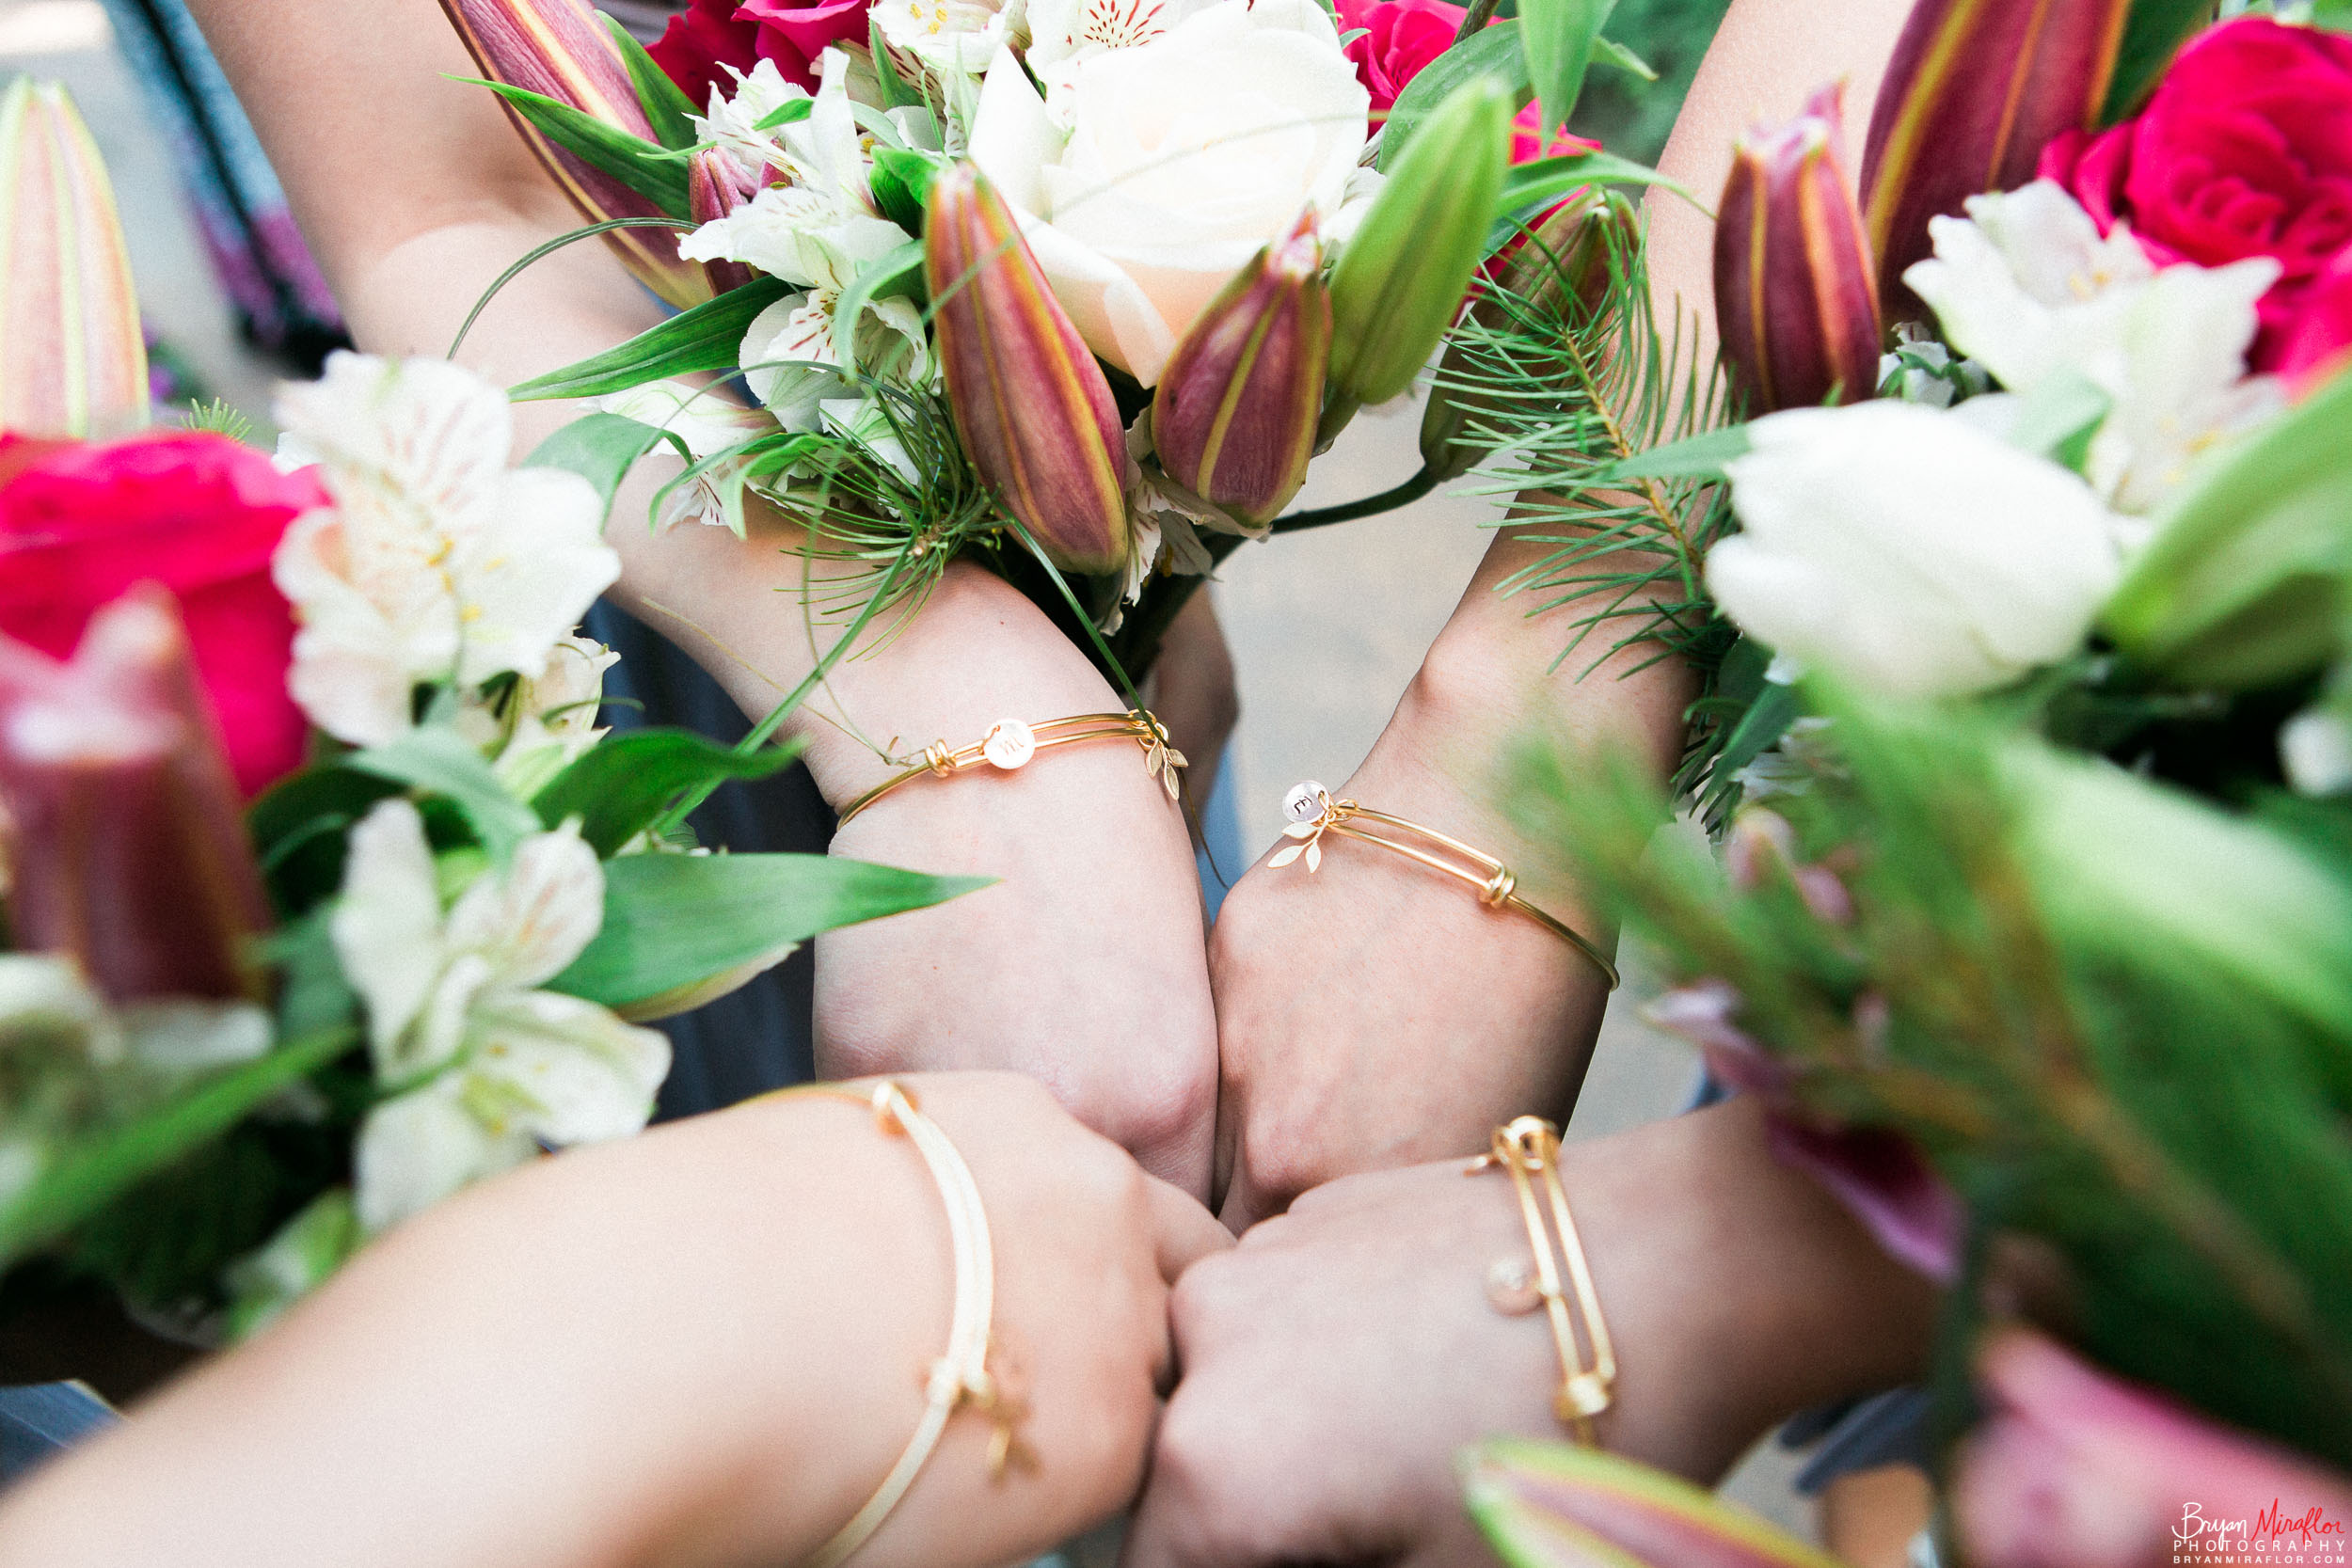 Bryan-Miraflor-Photography-Hannah-Jonathan-Married-Grand-Traditions-Estate-Gardens-Fallbrook-20171222-078.jpg